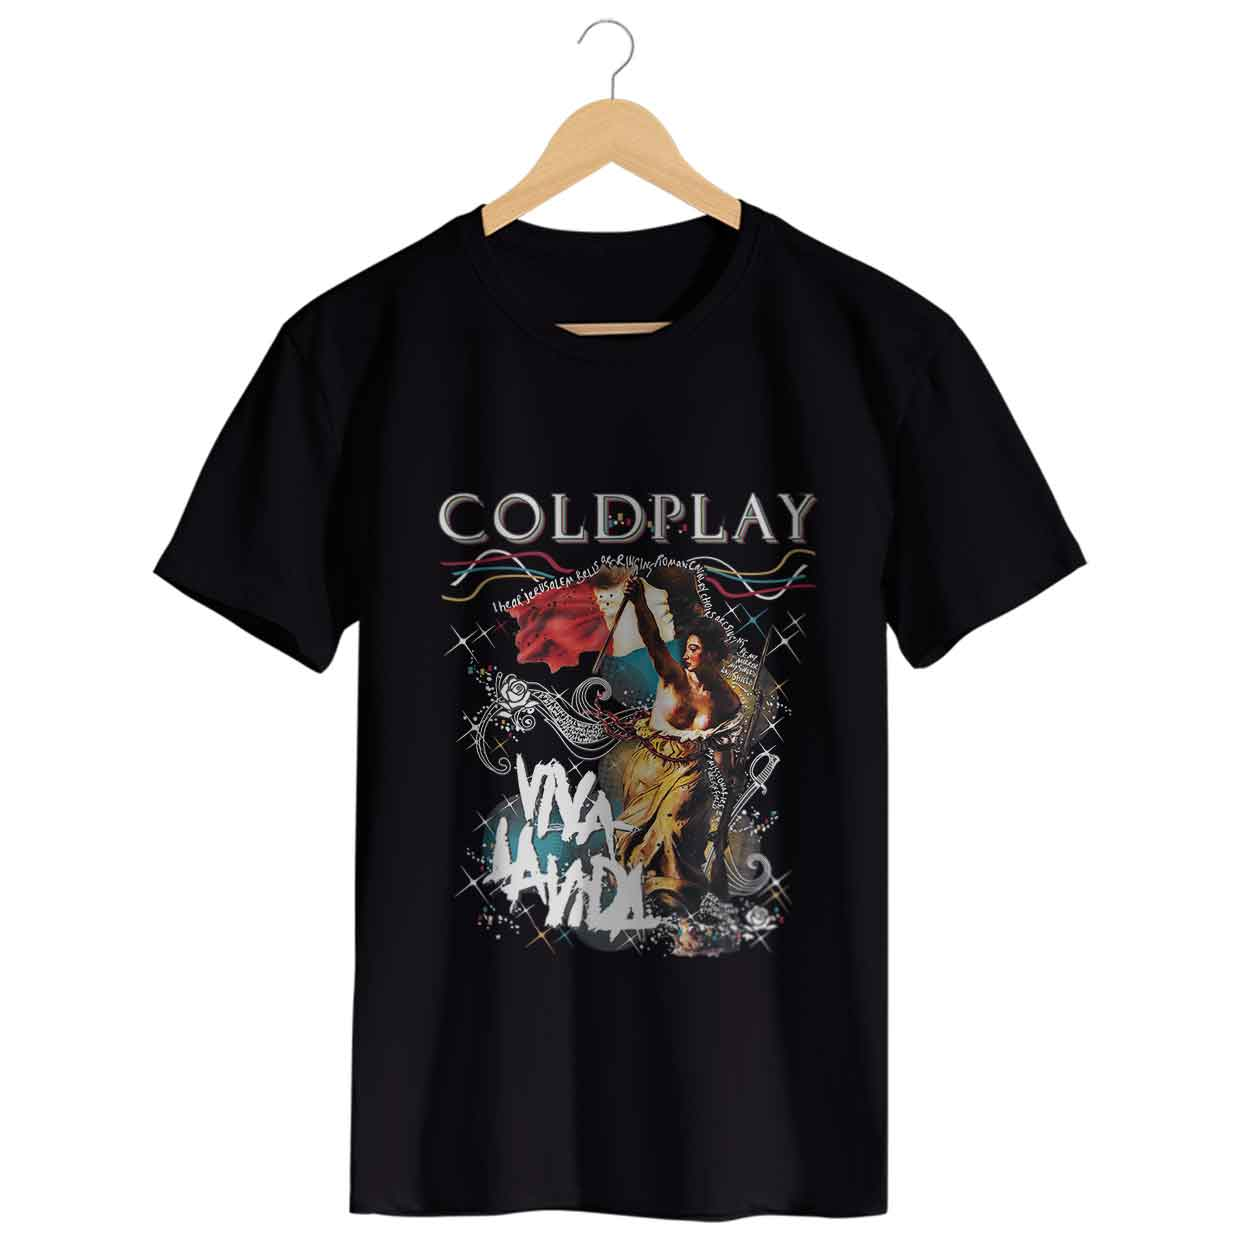 Camiseta - Viva La Vida - Coldplay - Masculino